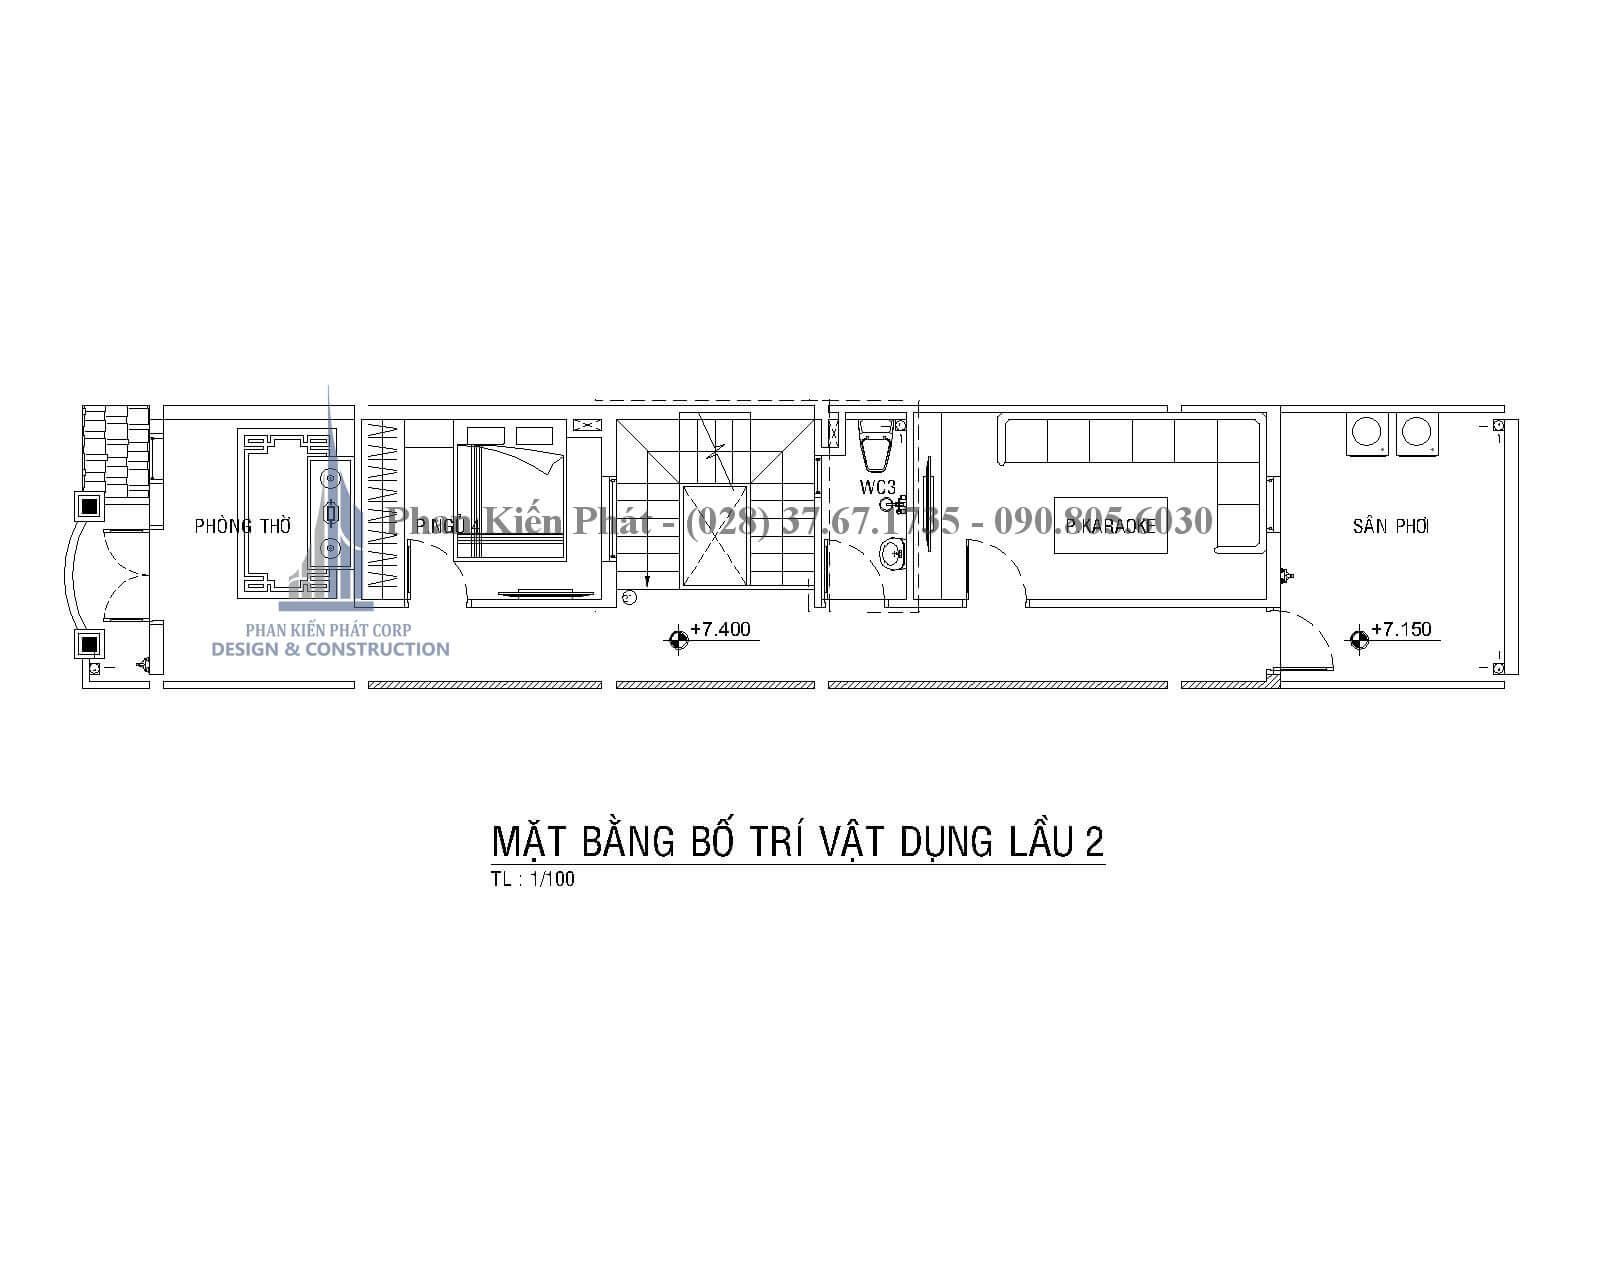 Thiet Ke Xay Dung Nha Dep Mat Bang Lau 2 Nha Pho Mai Thai - mẫu nhà phố 3 tầng tân cổ điển